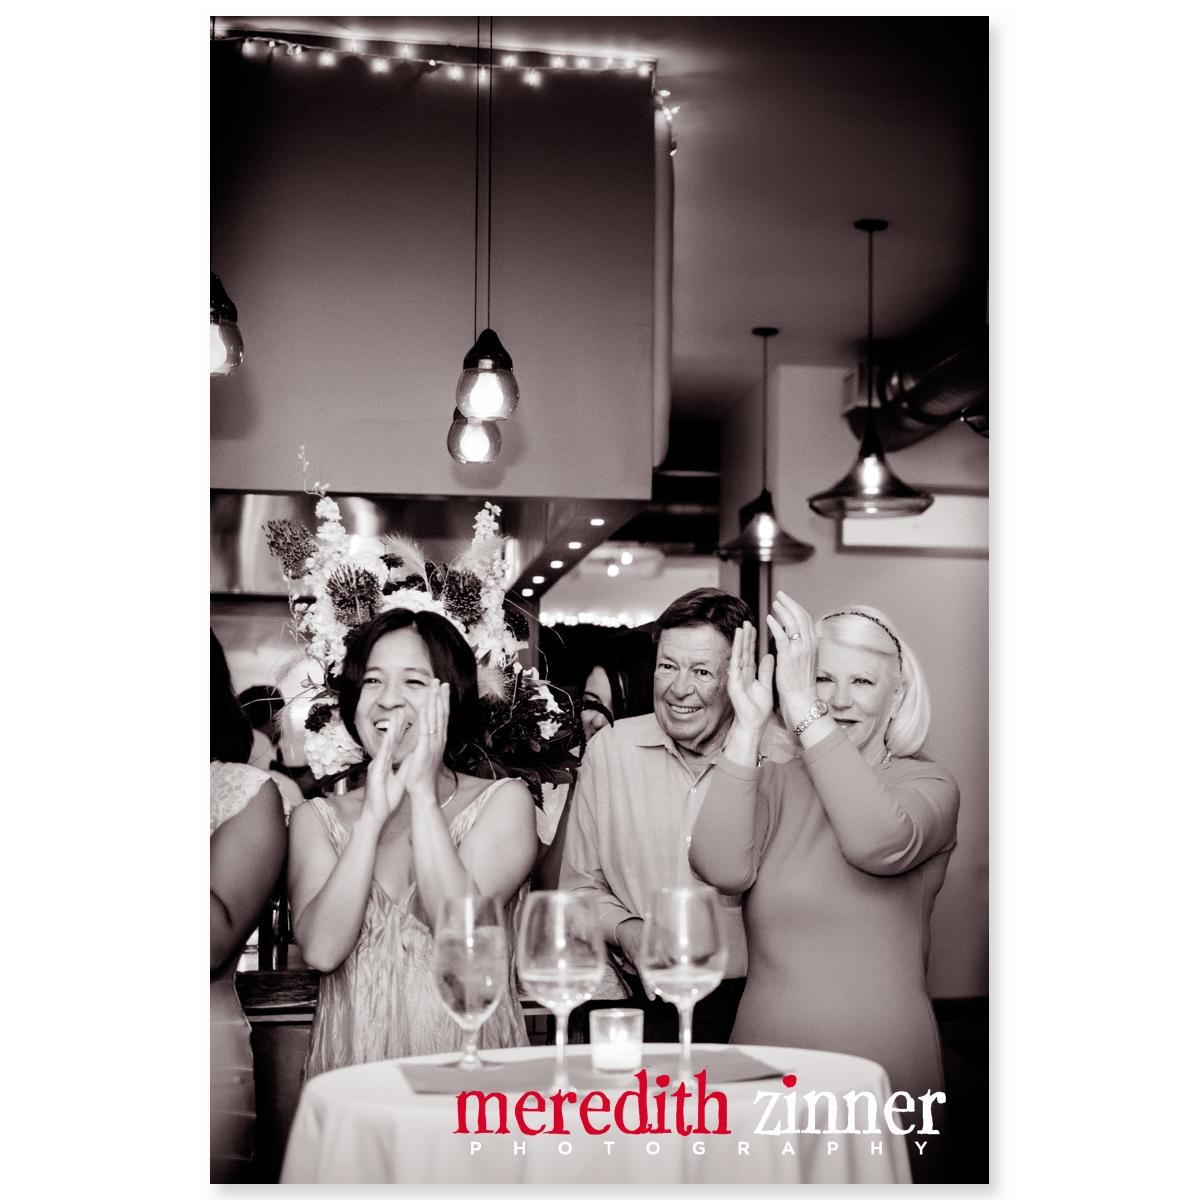 Meredith_Zinner_Photography_StilesCelebration_0317